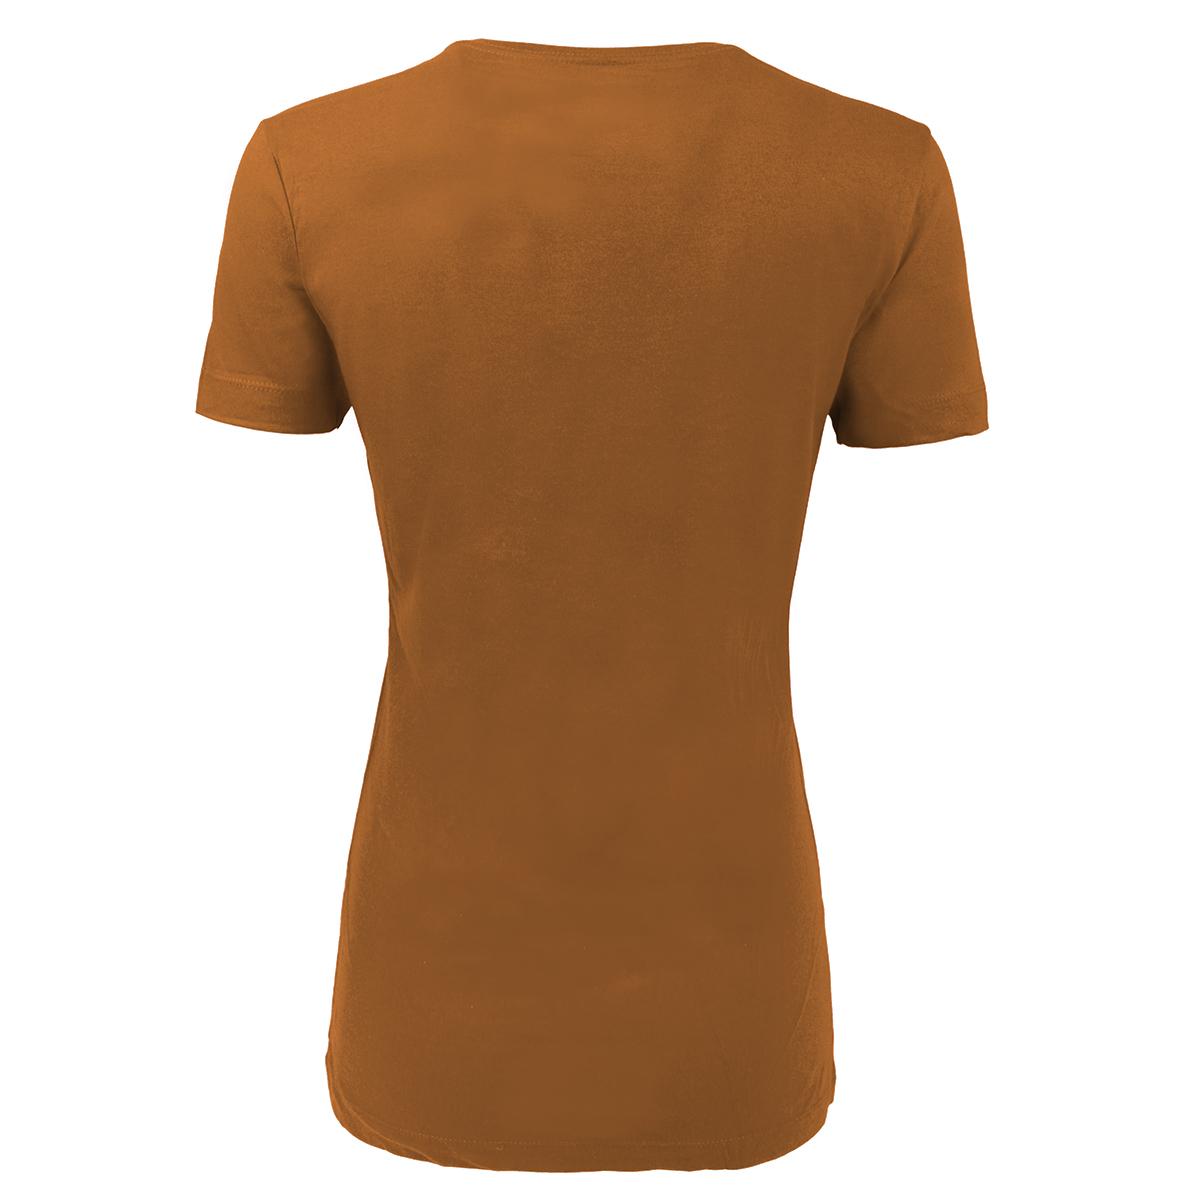 Nike-Women-039-s-Cotton-Slim-Fit-T-Shirt thumbnail 5